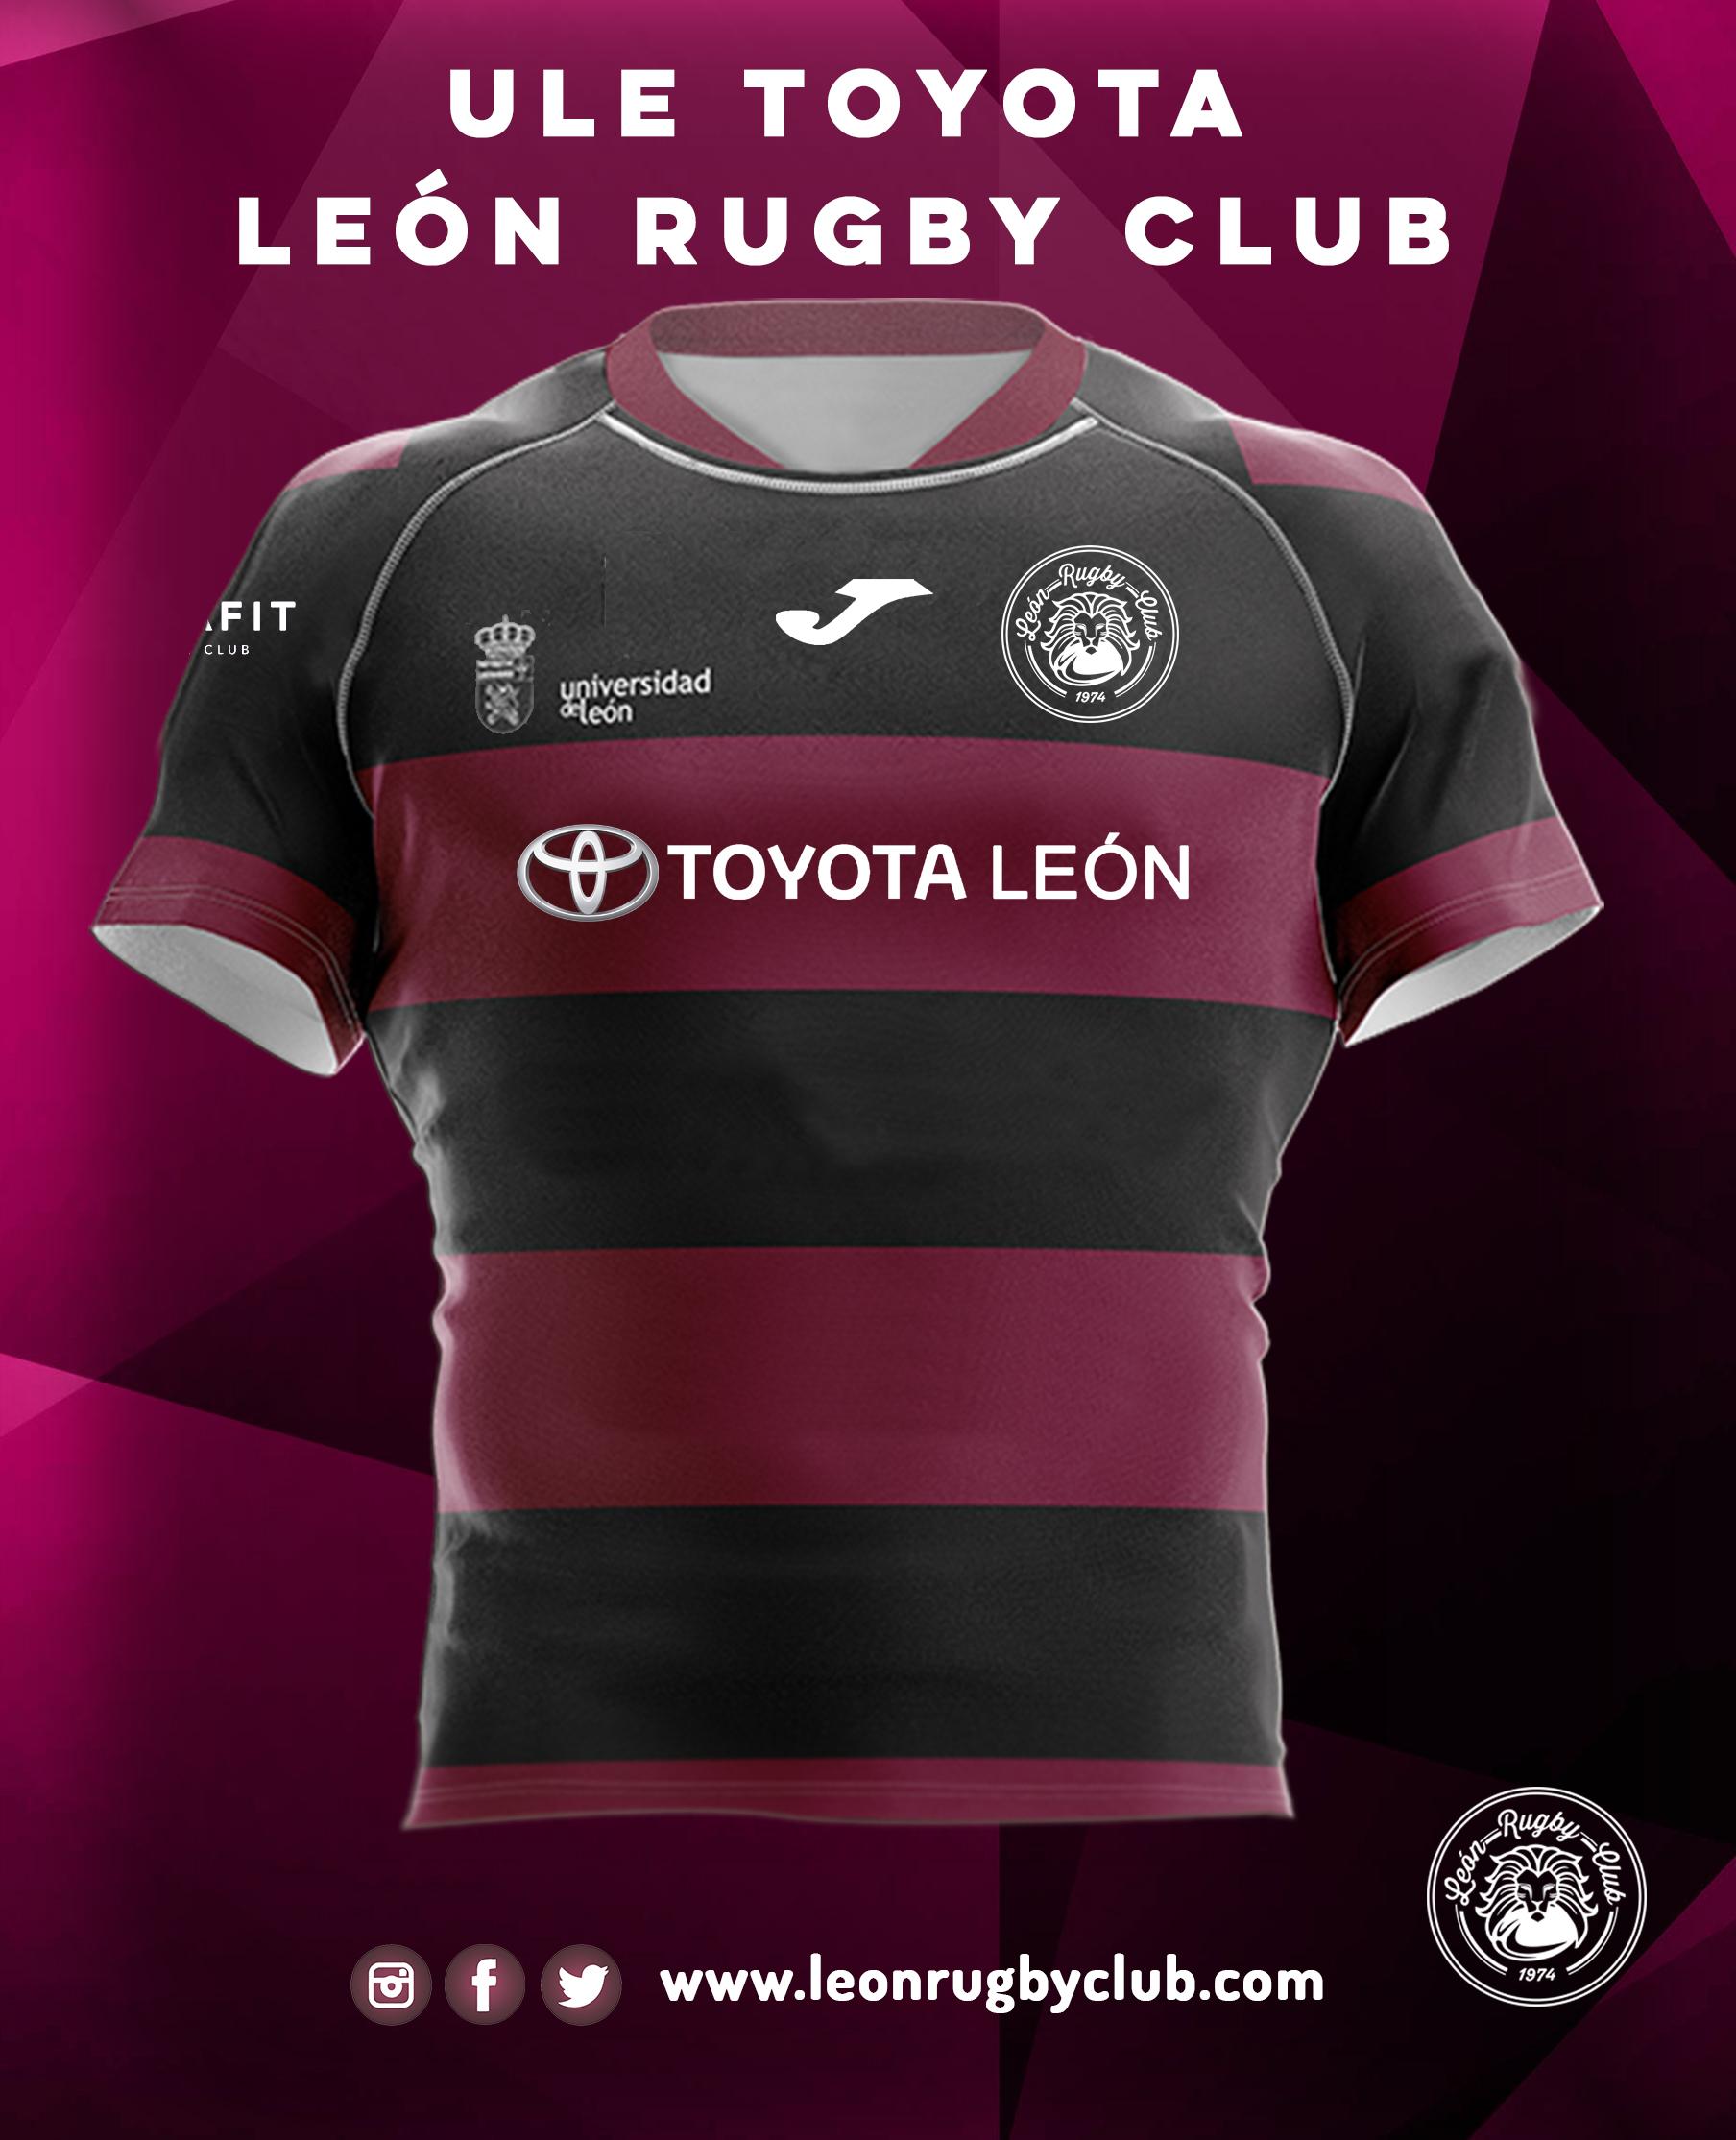 Camiseta de rugby reversible ULE Toyota León Rugby Club 19-20